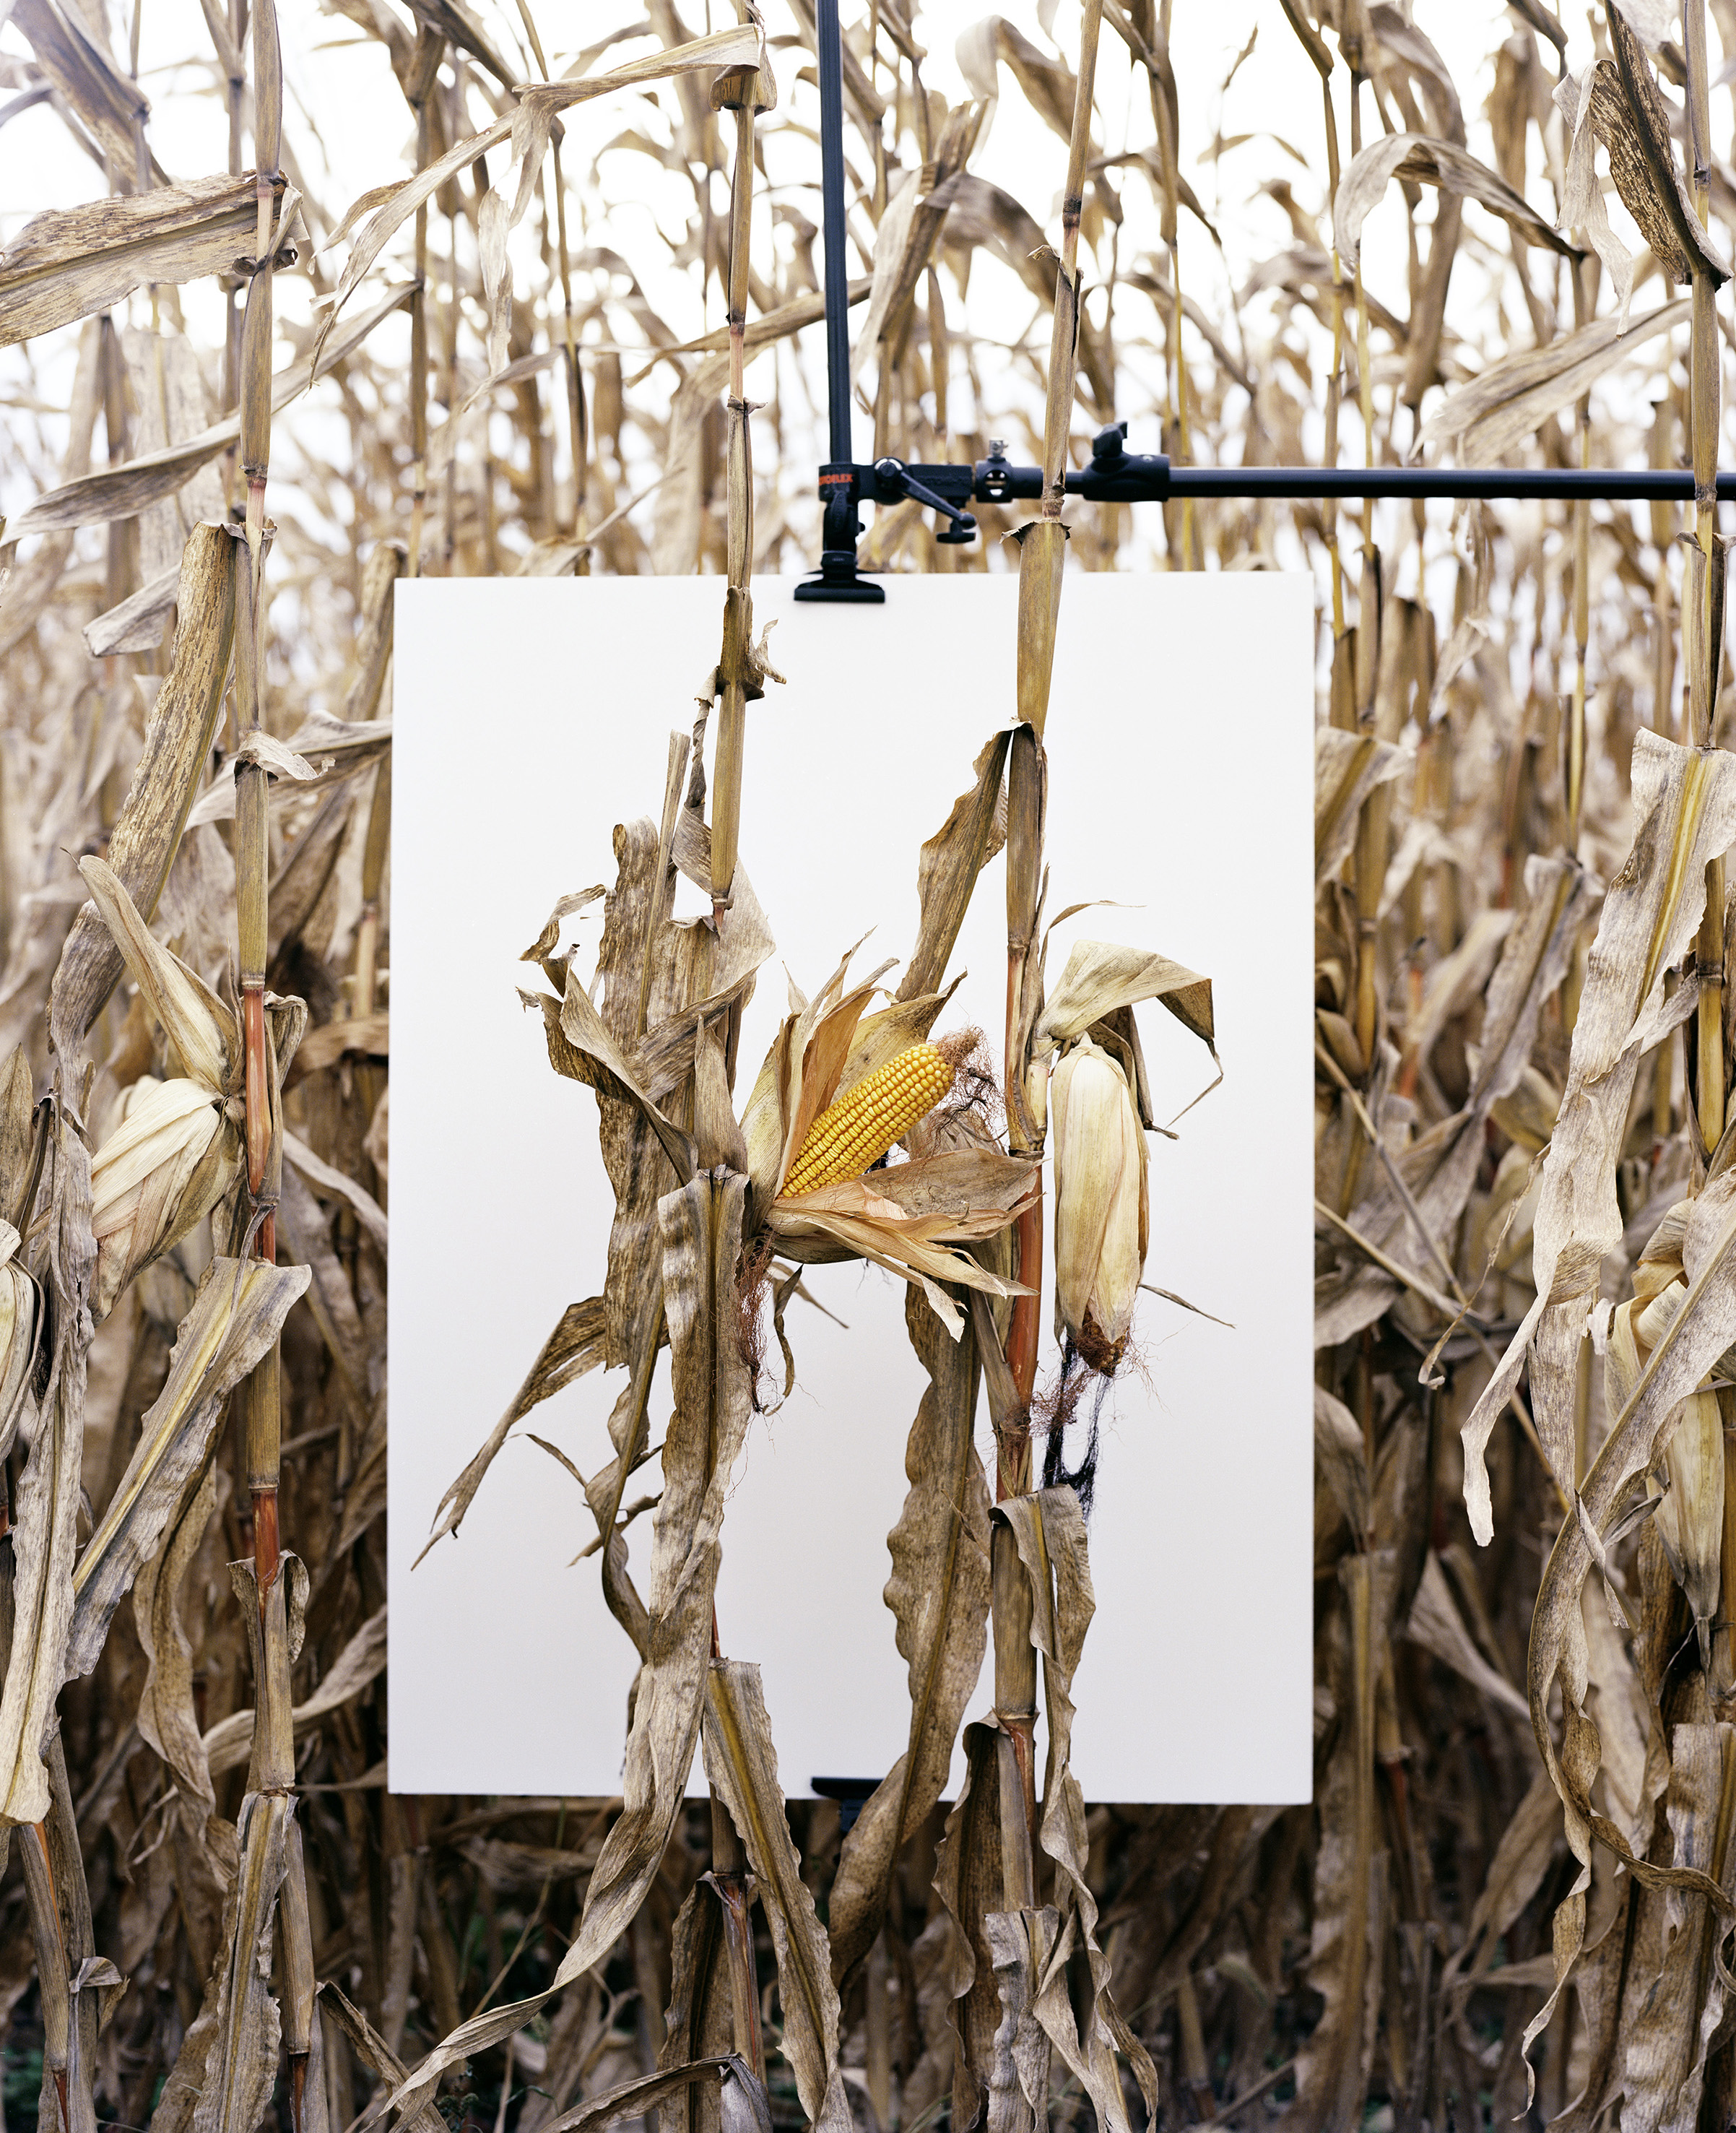 Mathieu Asselin (Γαλλία/Βενεζουέλα, γ. 1973) Van Buren, Ιντιάνα, 2013 Από τη σειρά Monsanto: A Photographic Investigation, 2016 Ευγενική παραχώρηση του καλλιτέχνη